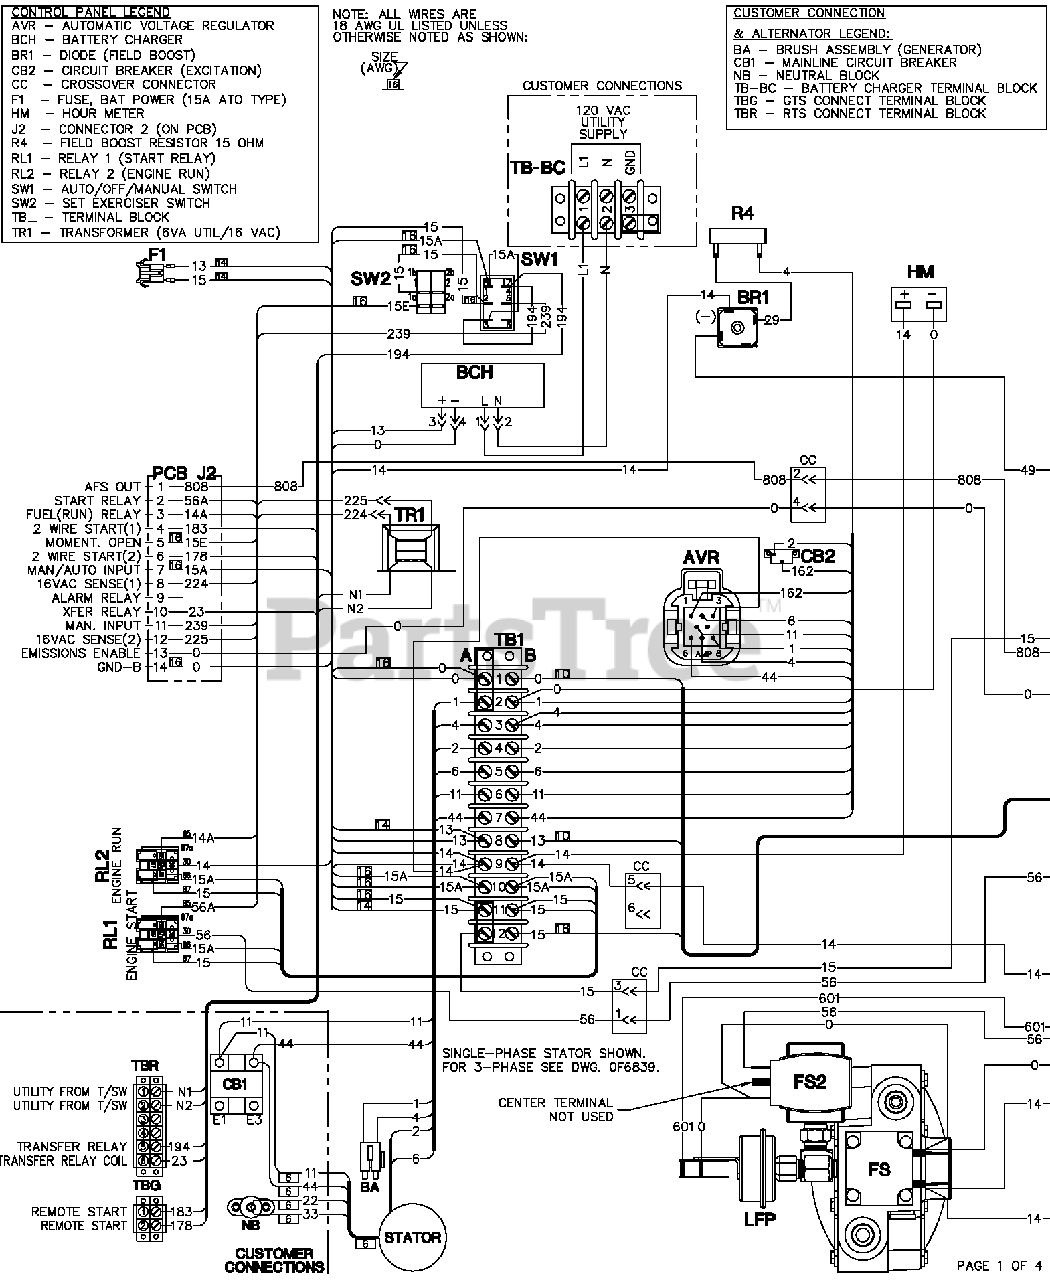 Generac QT04842GNAN - Generac 48kW Home Standby Generator ...